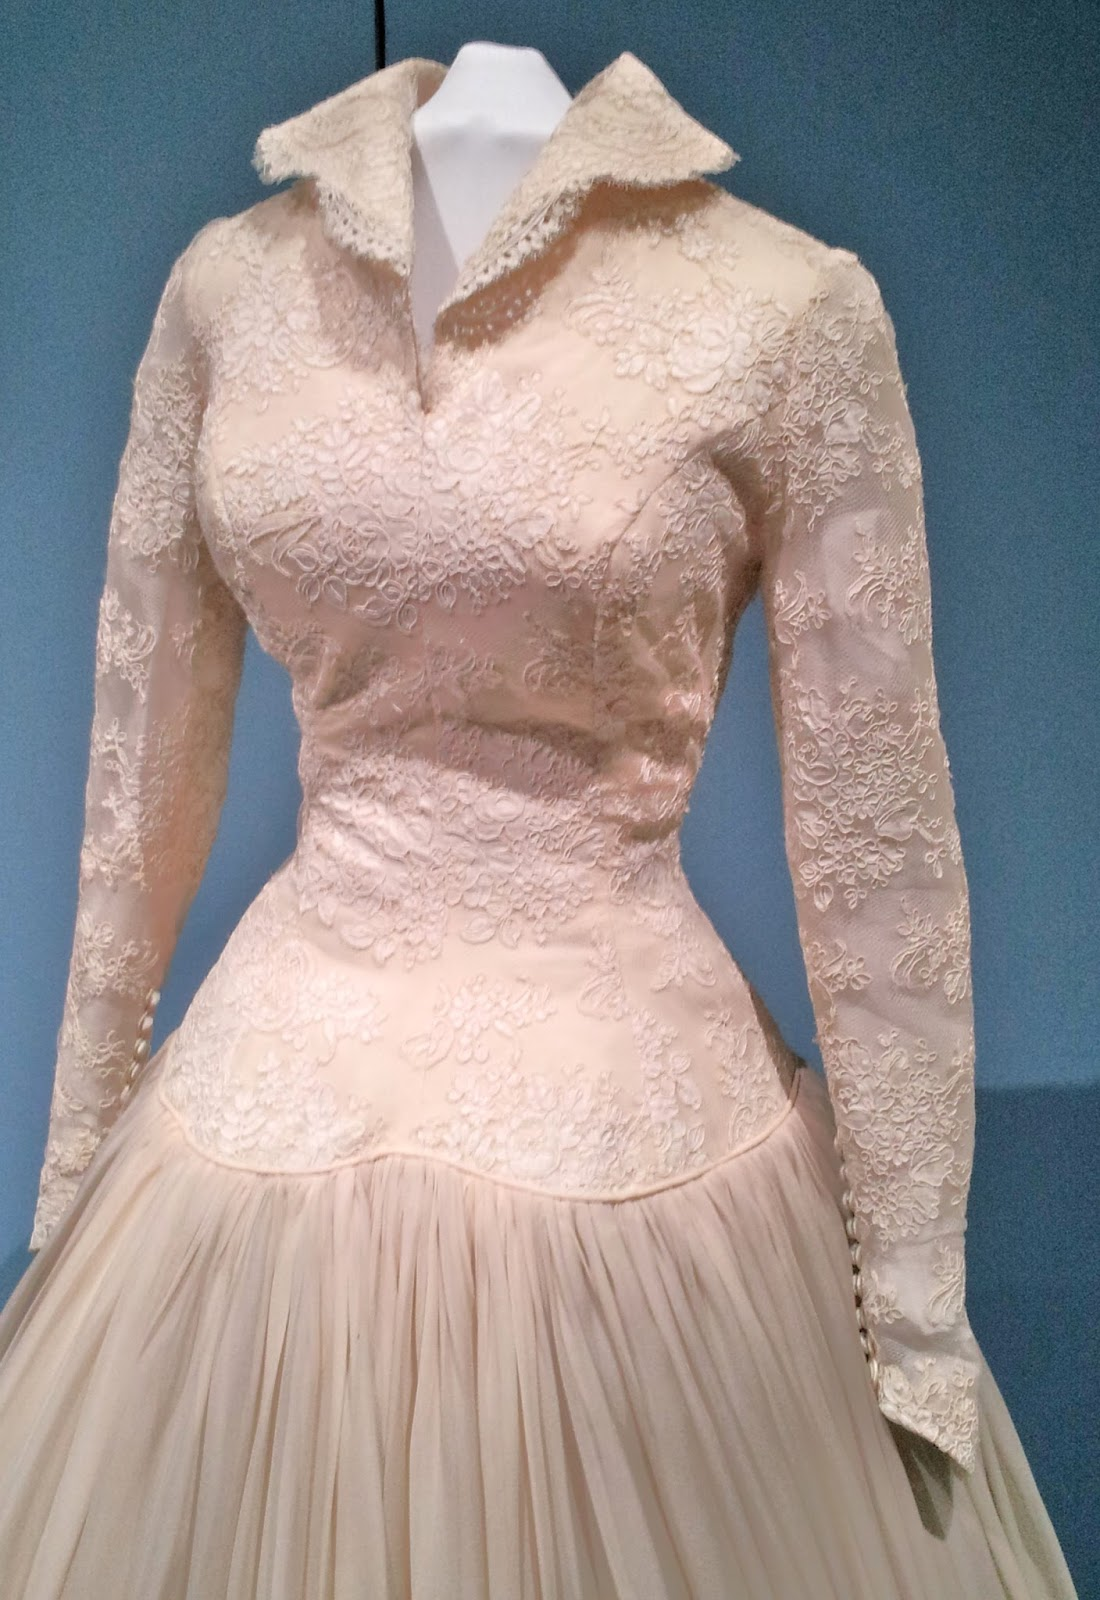 Pintucks Vintage Bridal Gowns On View At The Pasadena